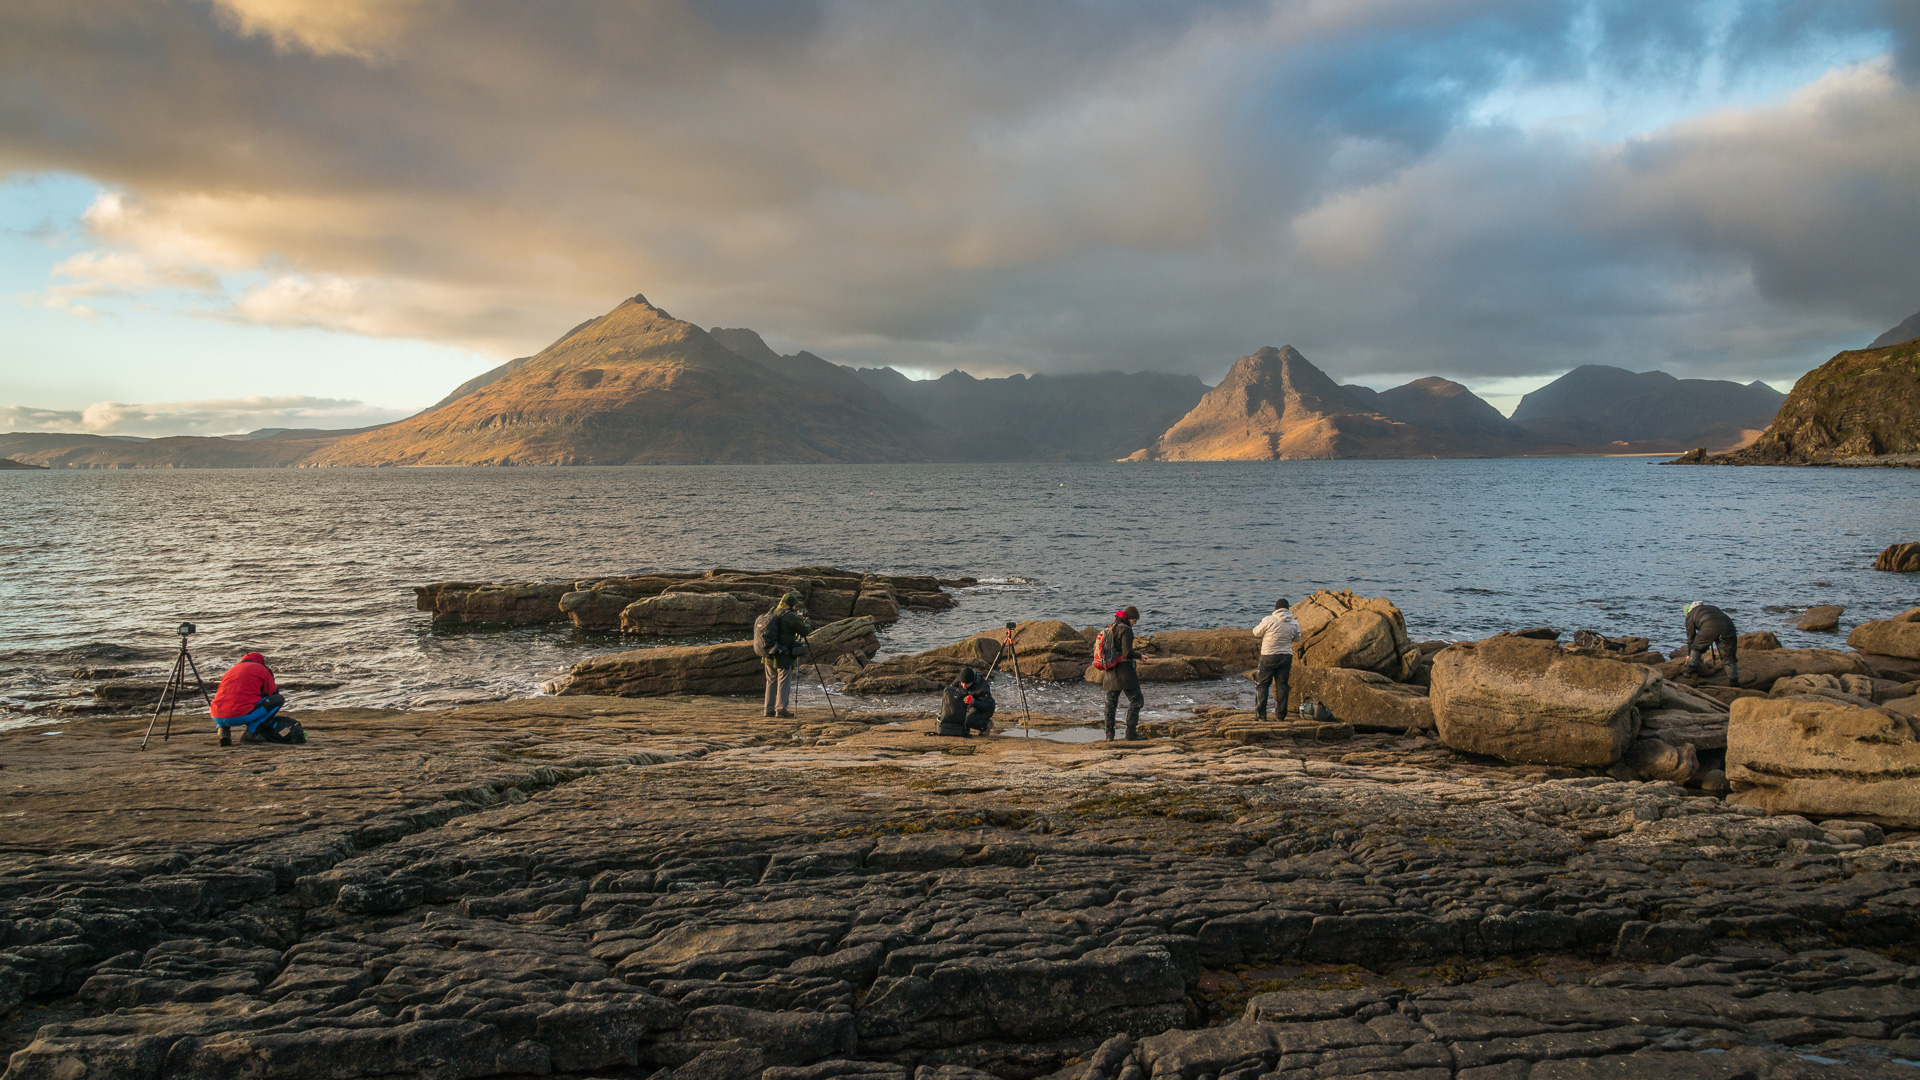 Ankunft vor dem Sonnenuntergang bei Elgol, Isle of Skye